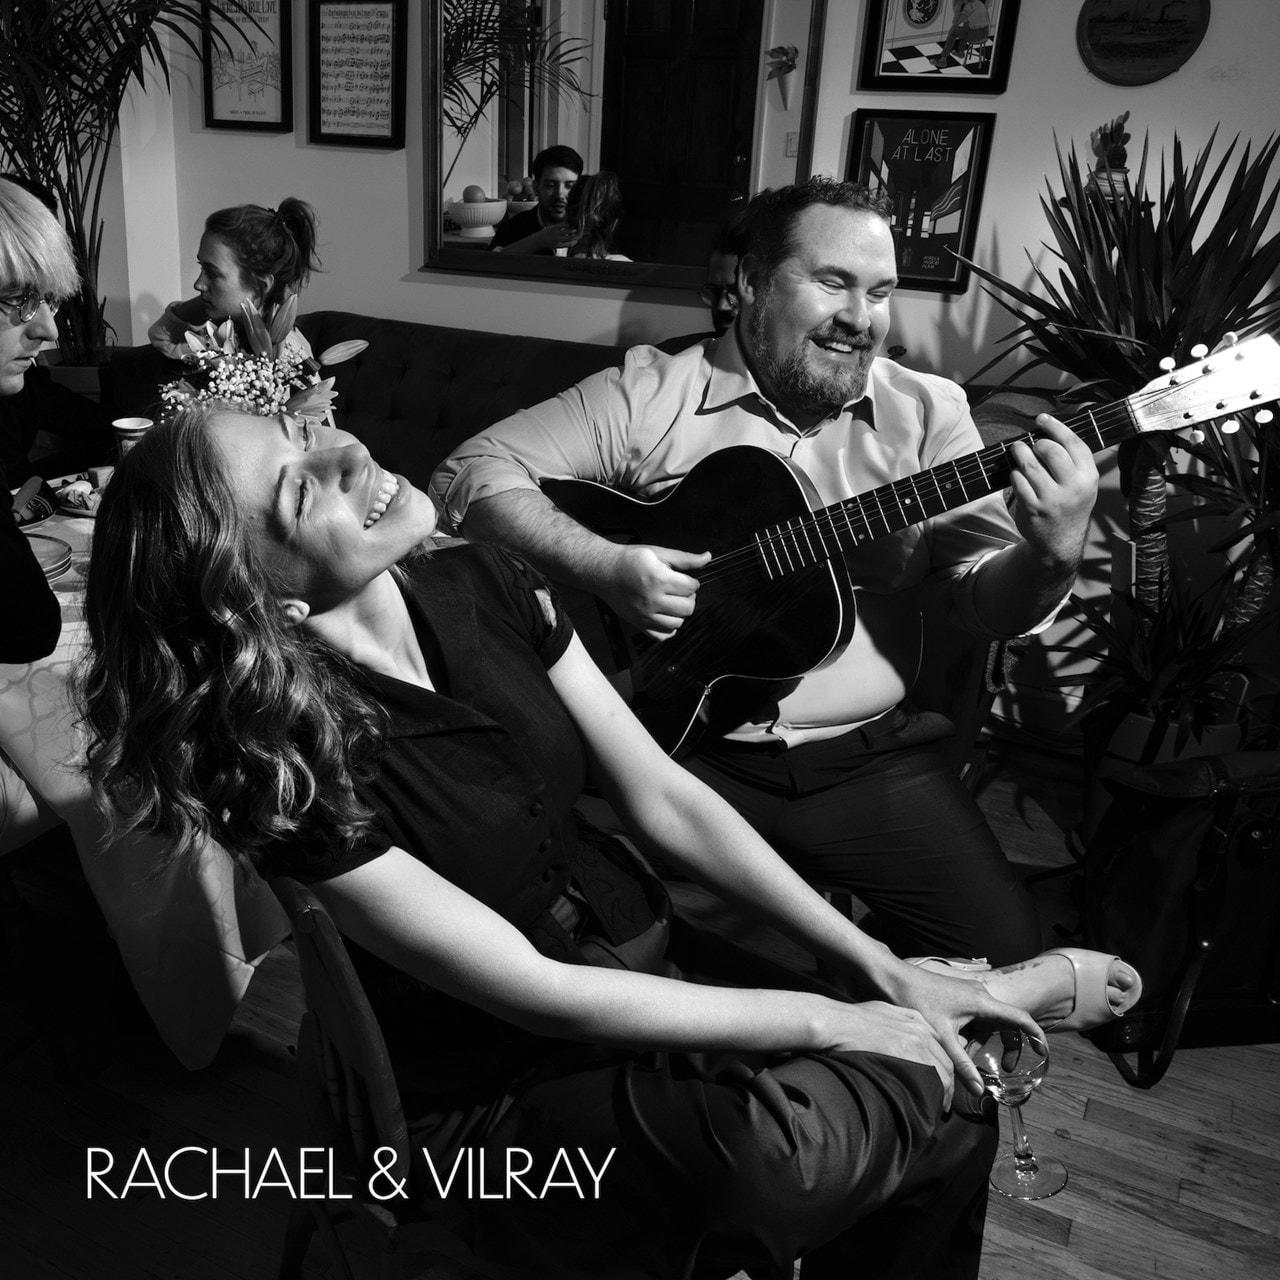 Rachael & Vilray - 1